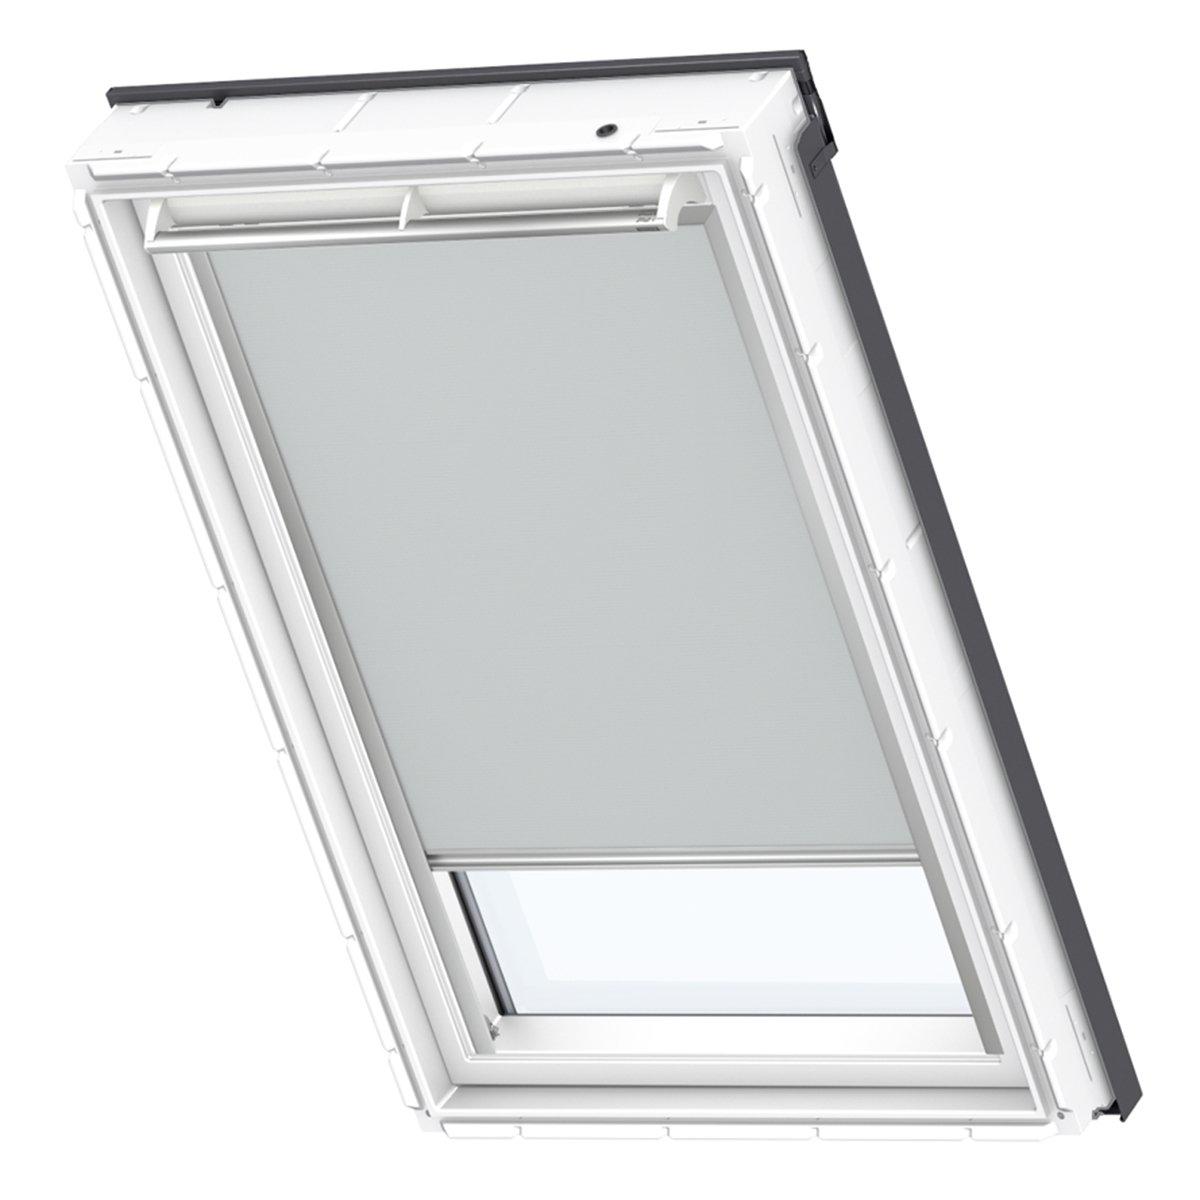 VELUX Original Verdunkelungrollo Dachfenster, UK08, Uni Grau